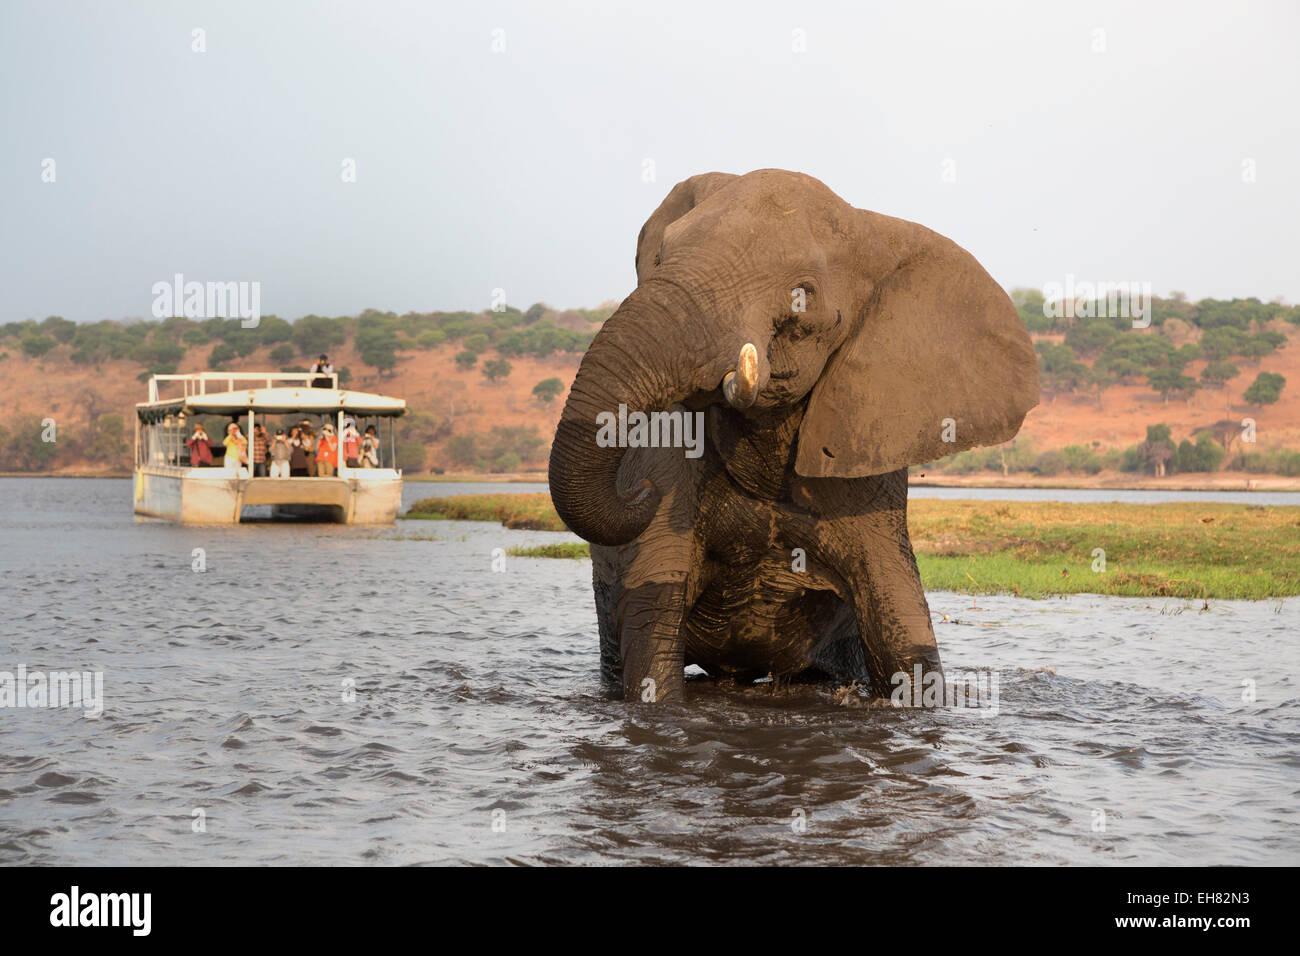 Afrikanischer Elefant (Loxodonta Africana) und Touristen, Chobe Nationalpark, Botswana, Afrika Stockbild